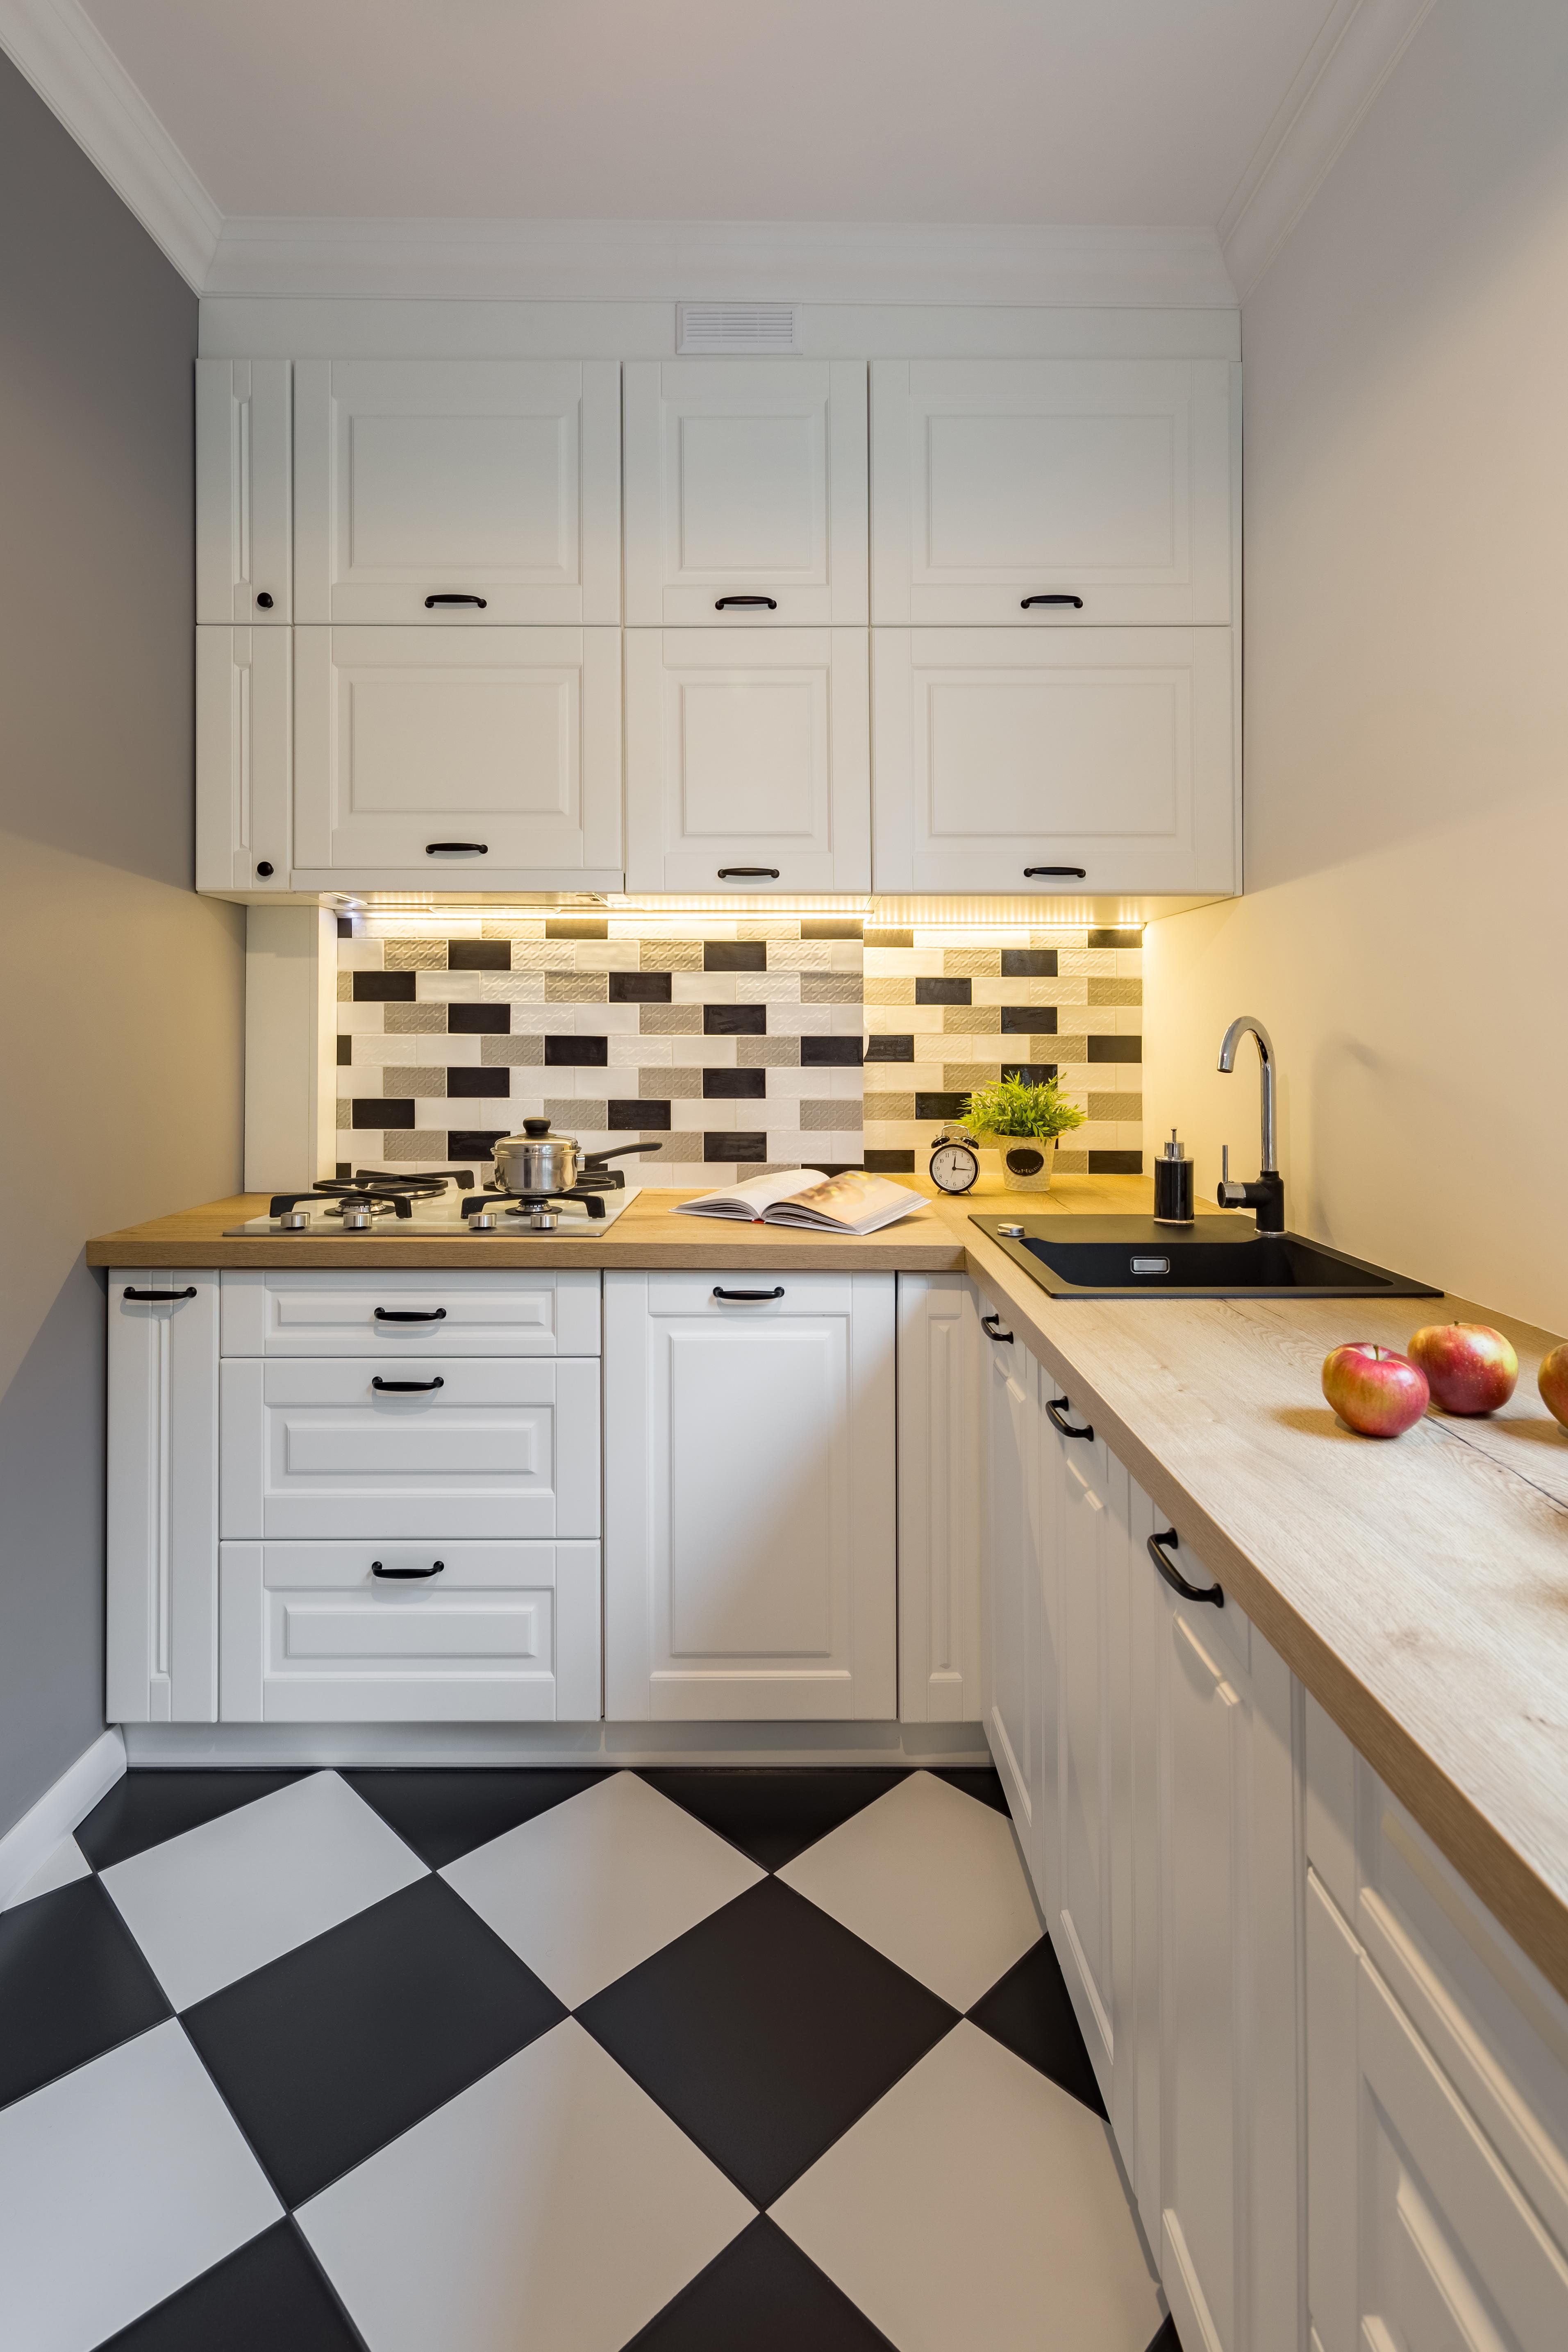 12 Trendy Modular Kitchen Design Ideas For Small Kitchens Homelane Blog